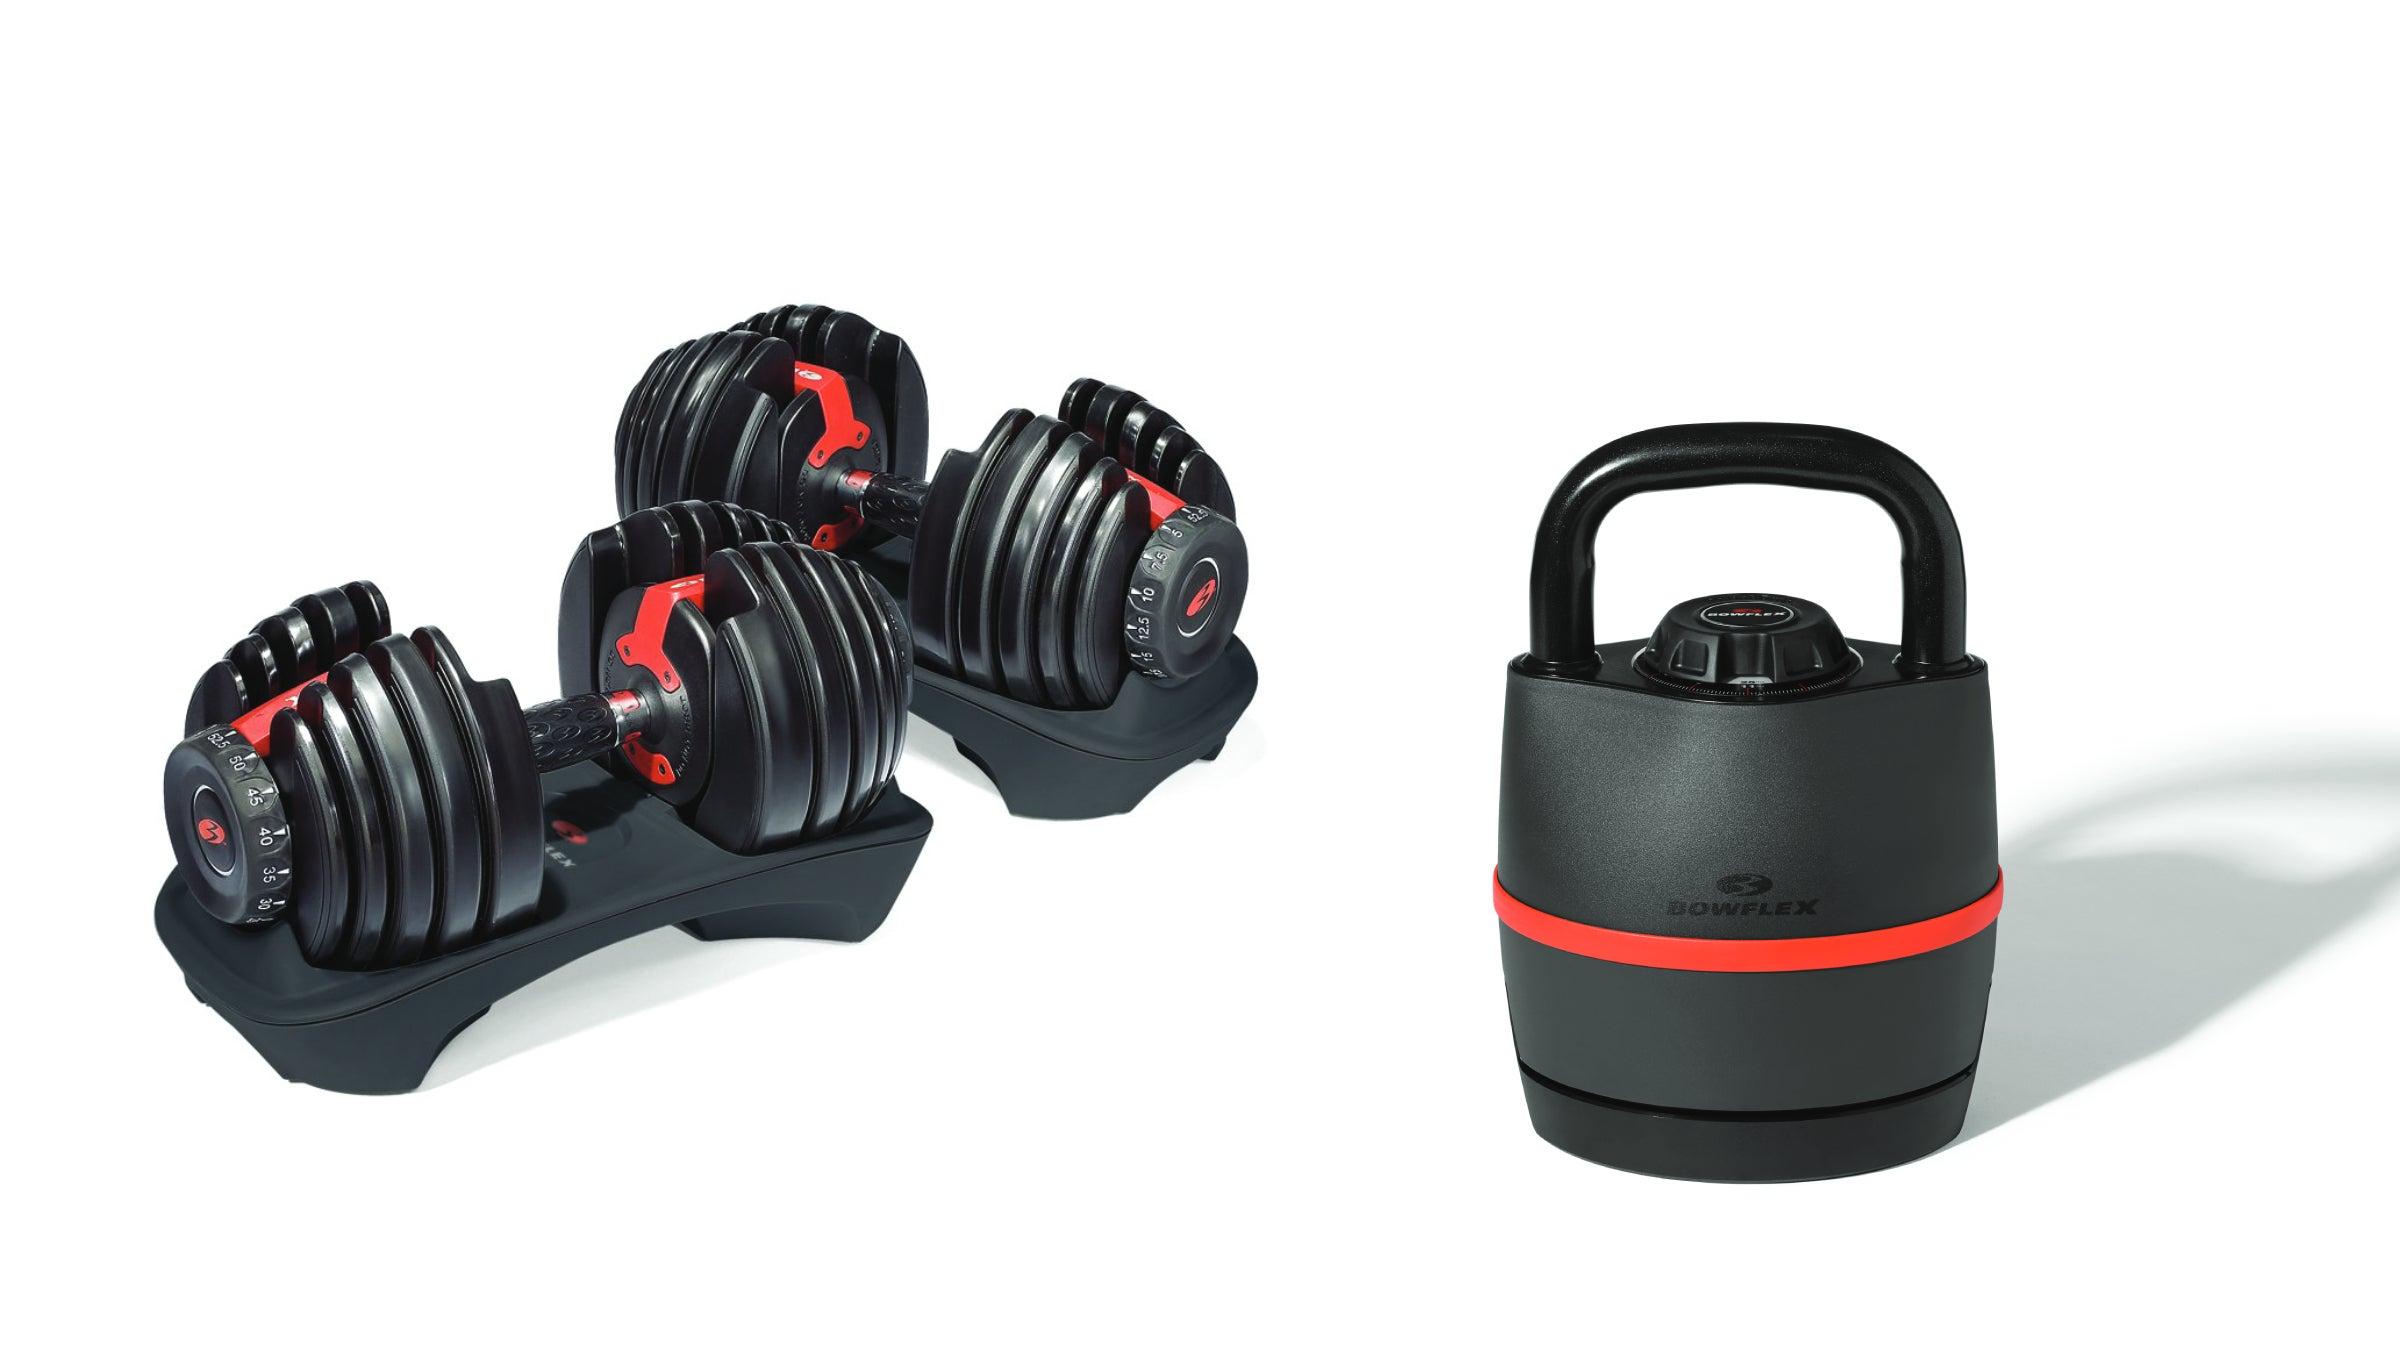 Bowflex adjustable dumbbells and kettlebell